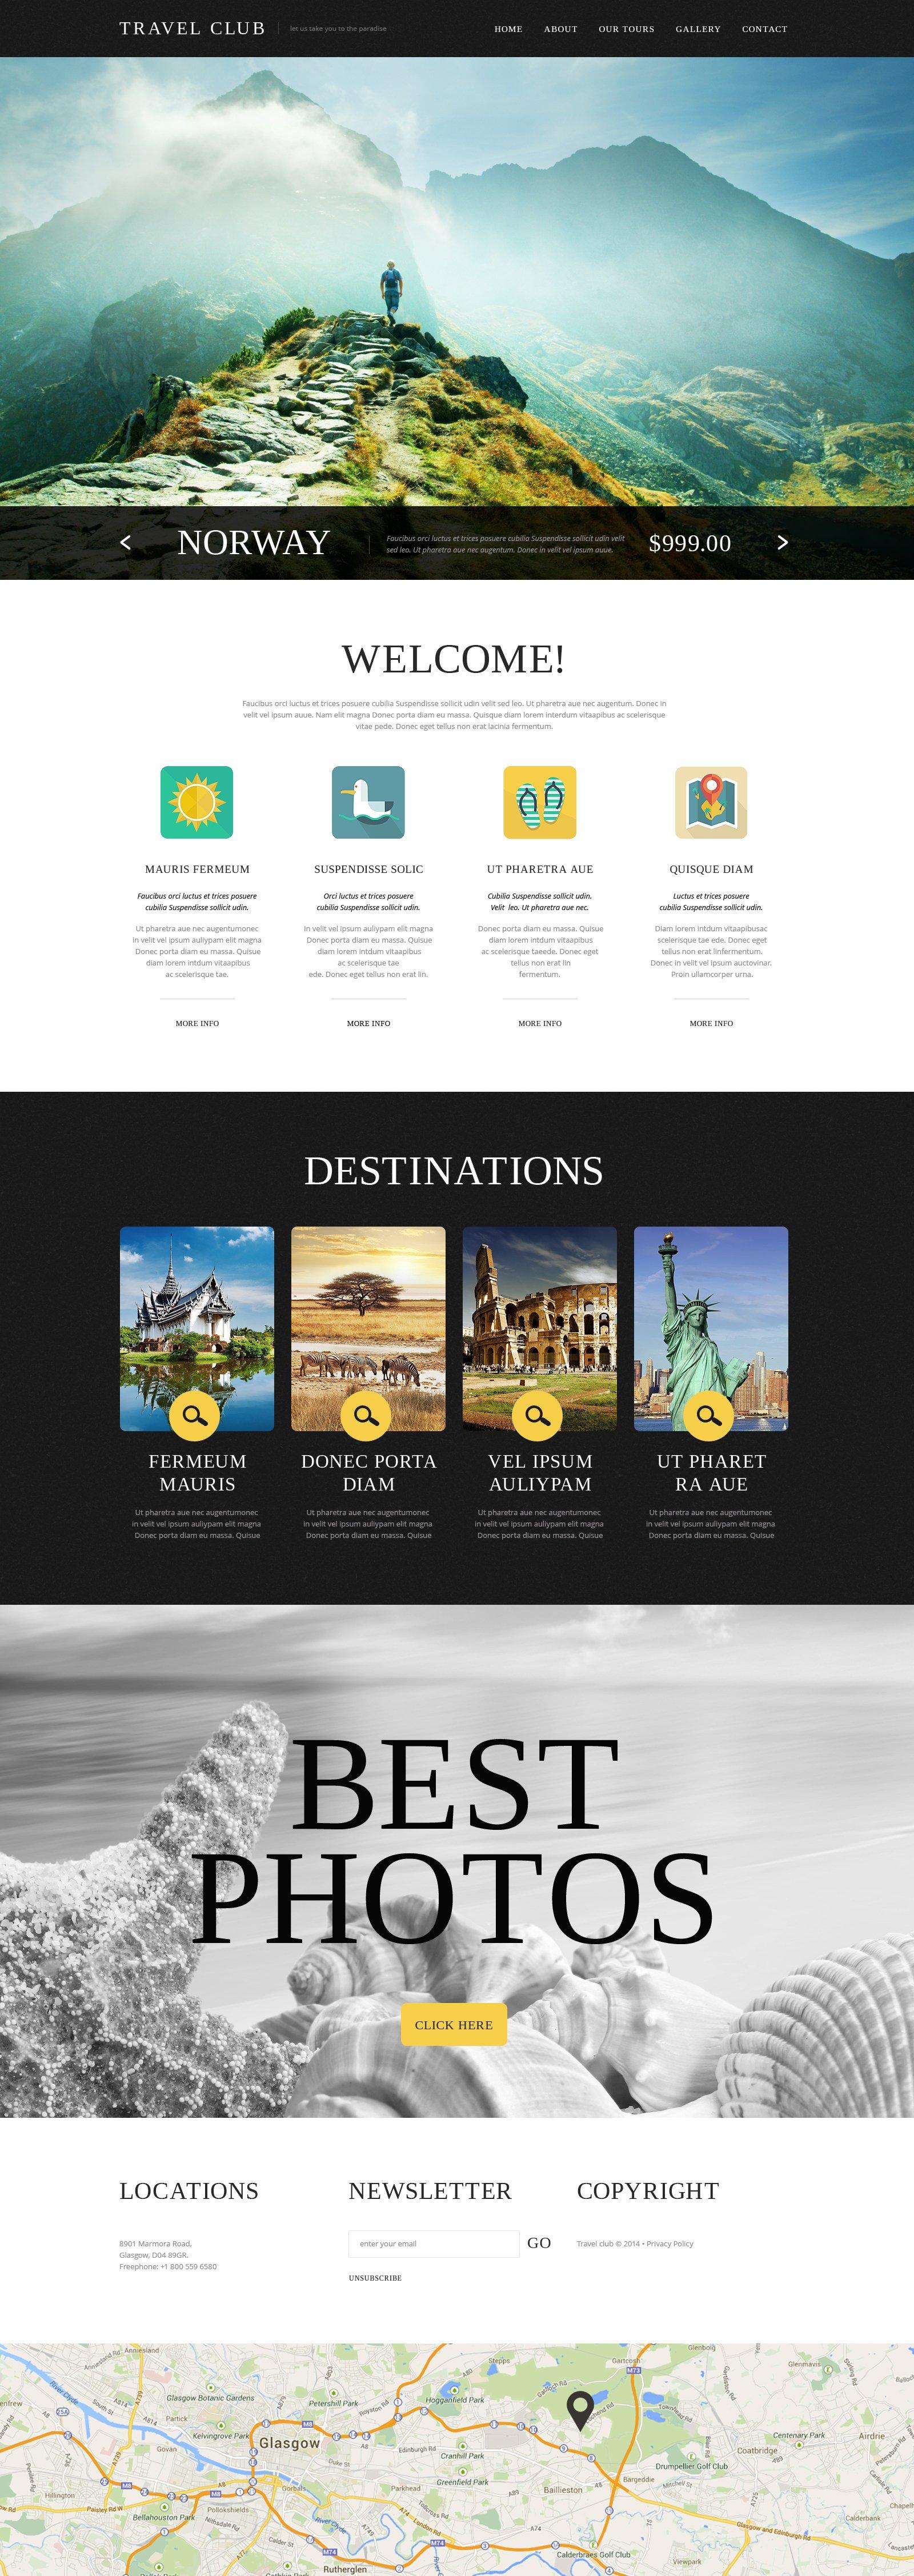 Template Web Bootstrap para Sites de Agencia de Viagens №49528